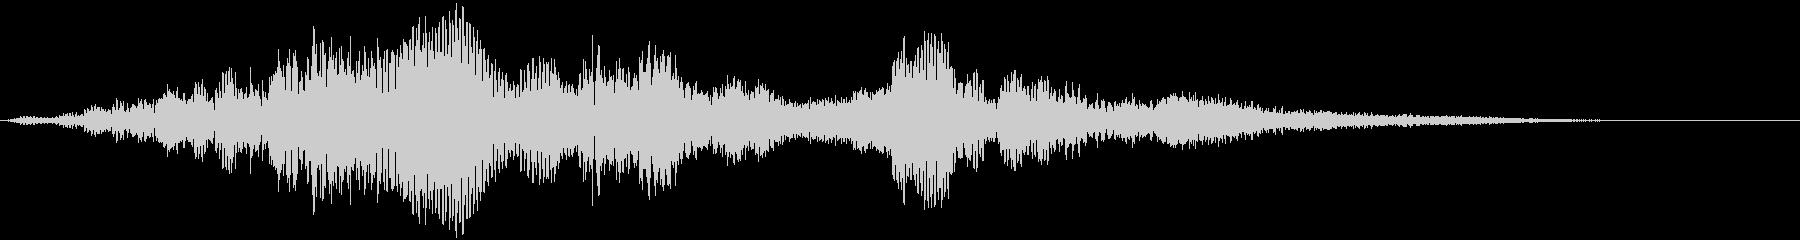 【SF映像演出】デジタルな音_01の未再生の波形